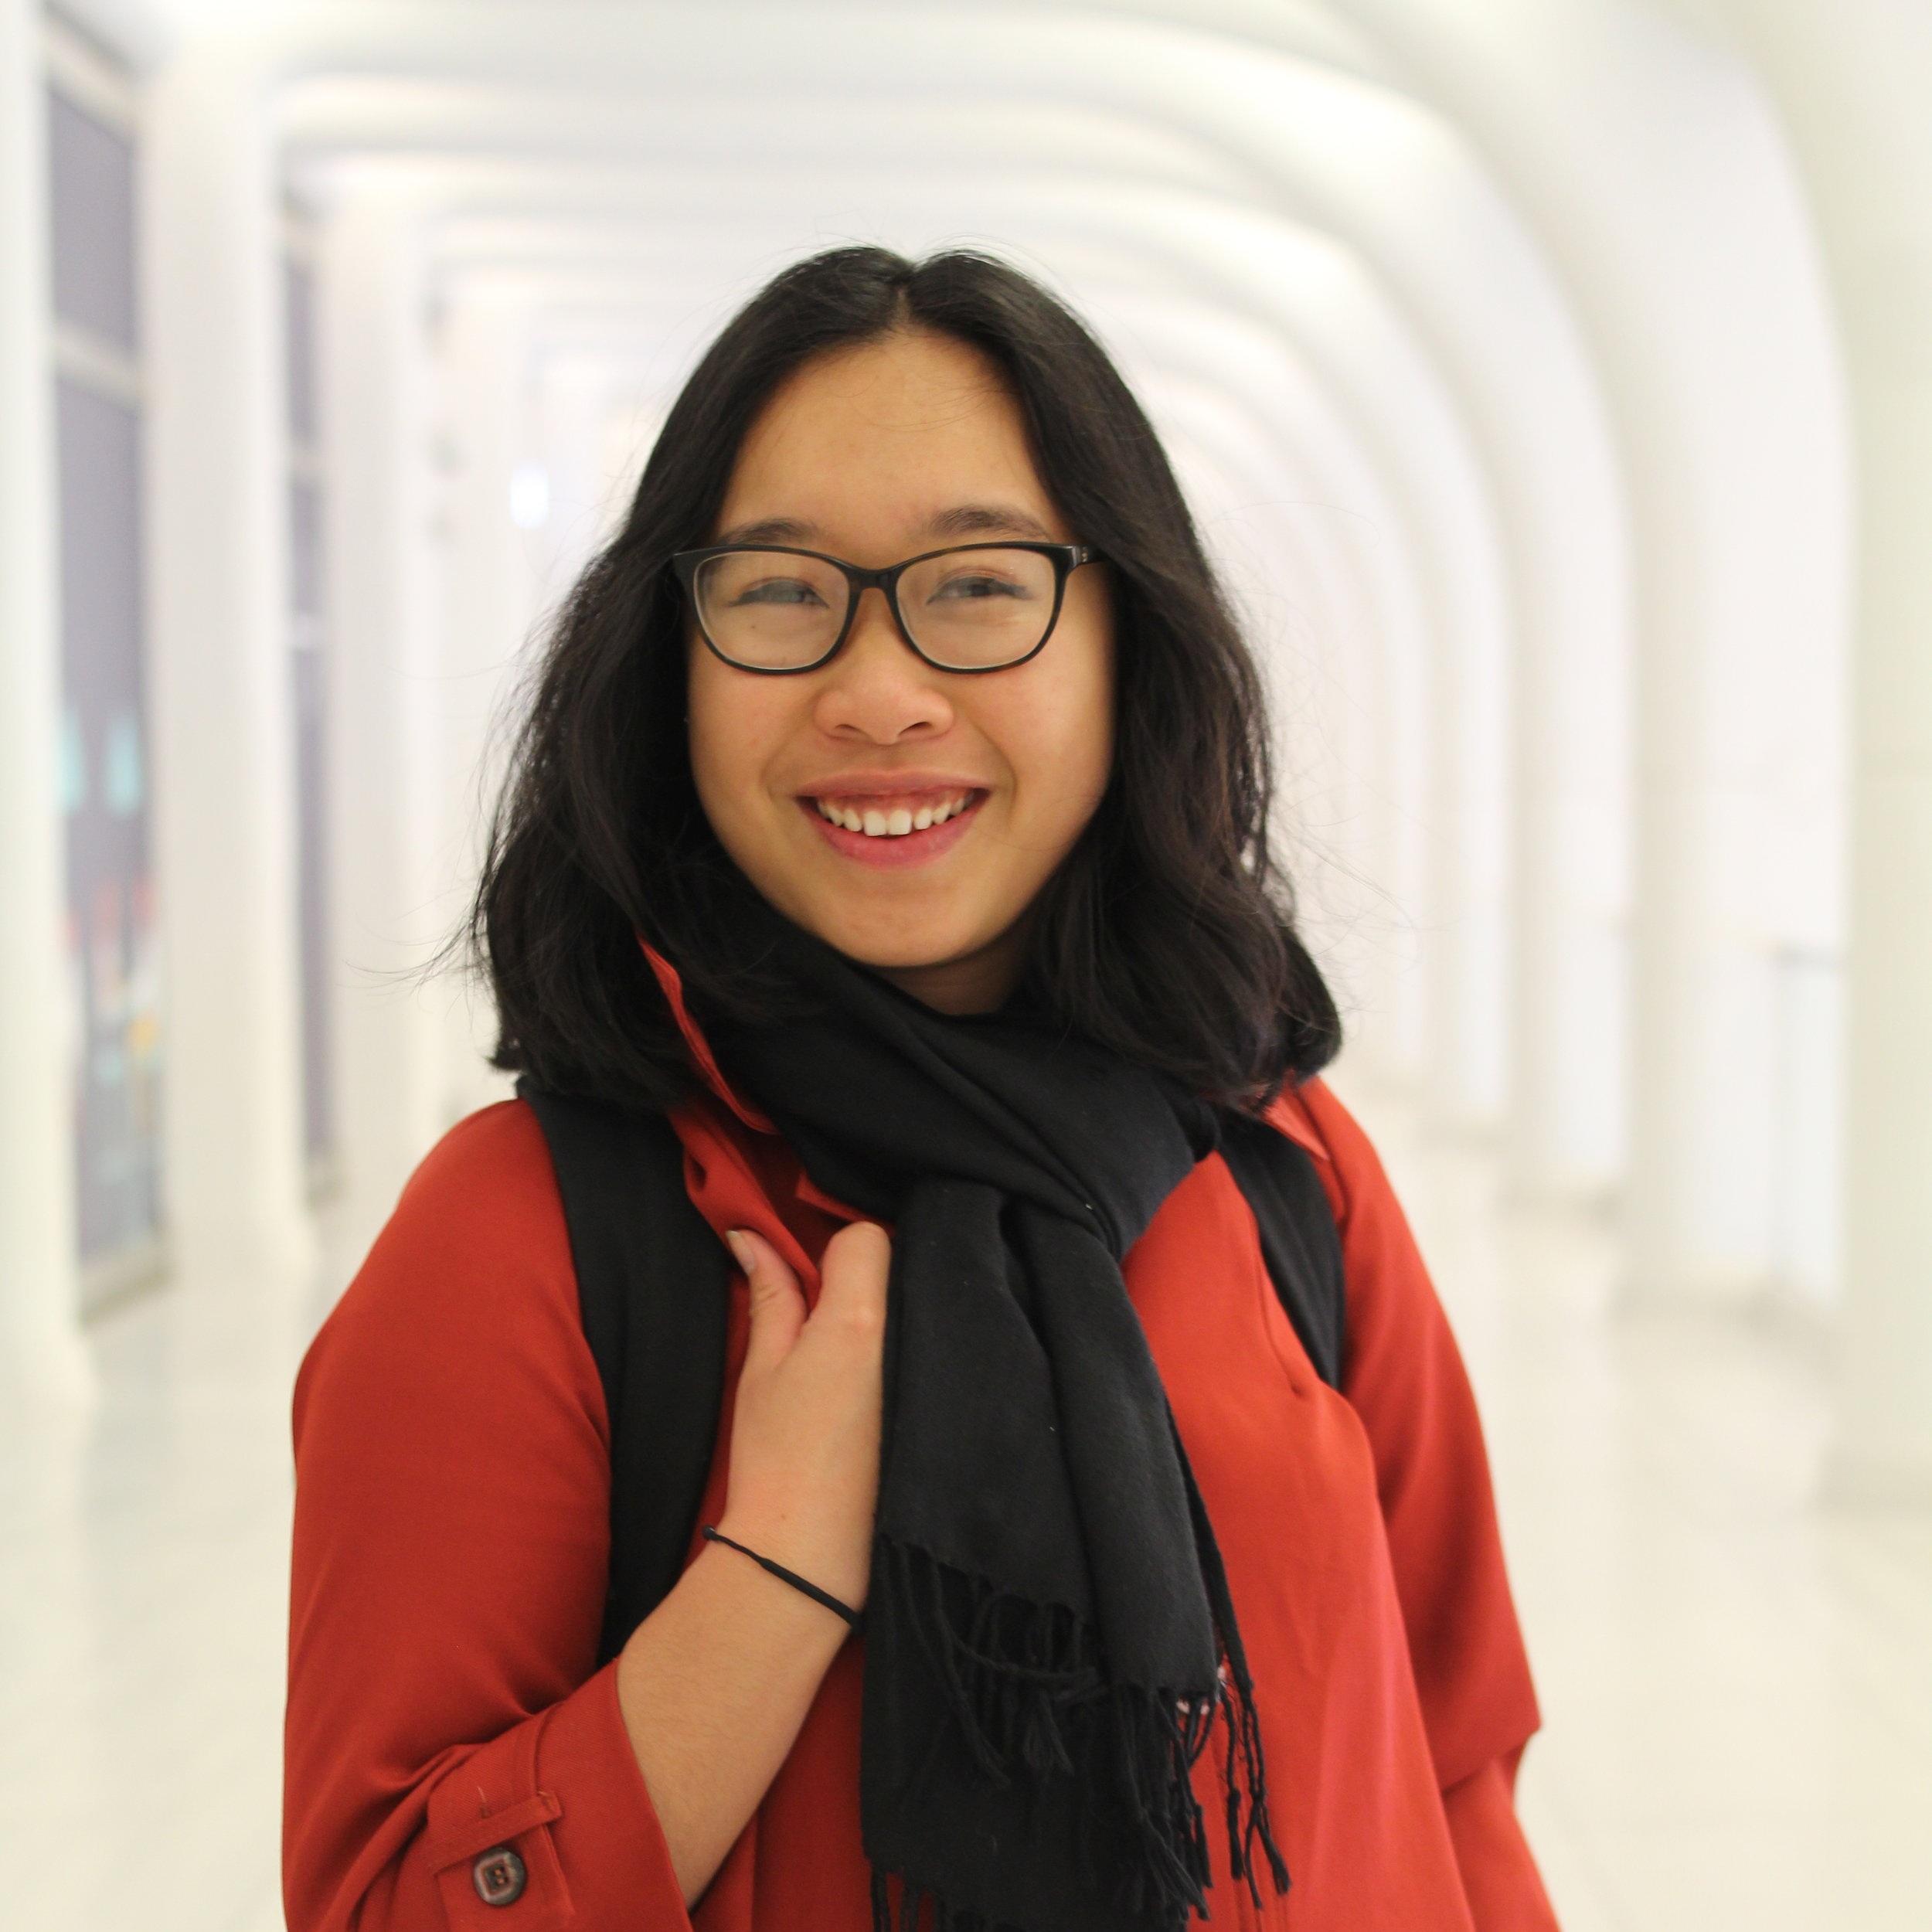 Cheyenne Cheng -